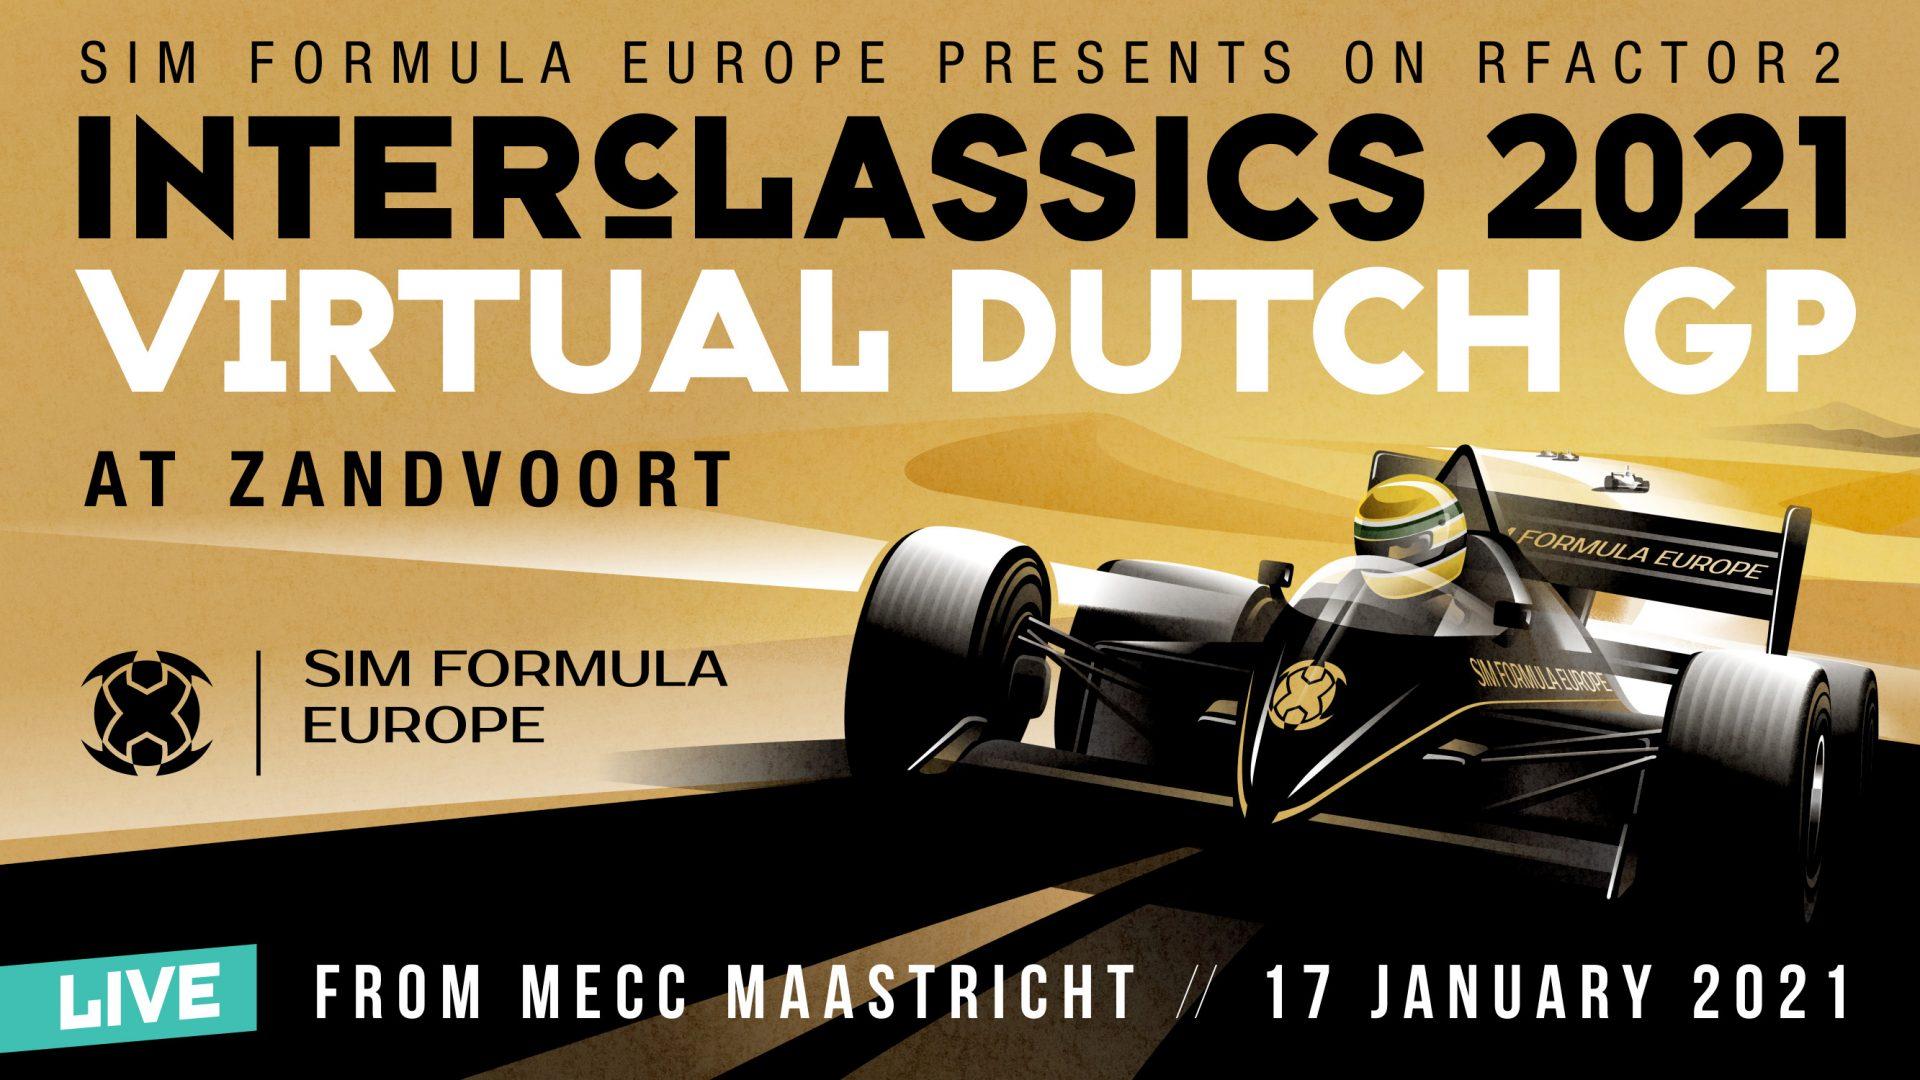 Studio-397: Presenting rFactor 2 Sim Formula Europe 2021